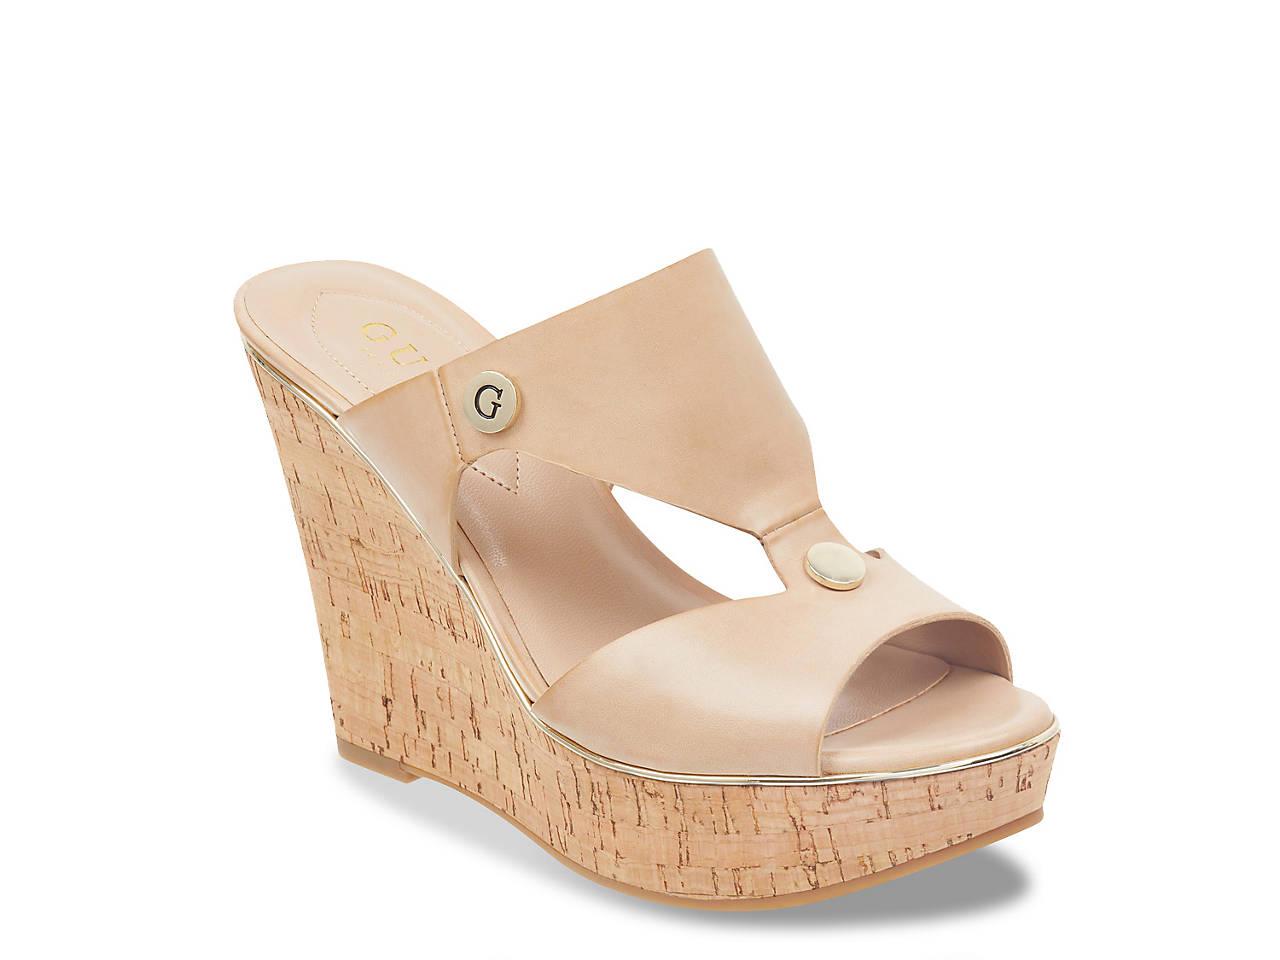 88d7b41c3 Guess Sheley Wedge Sandal Women's Shoes | DSW